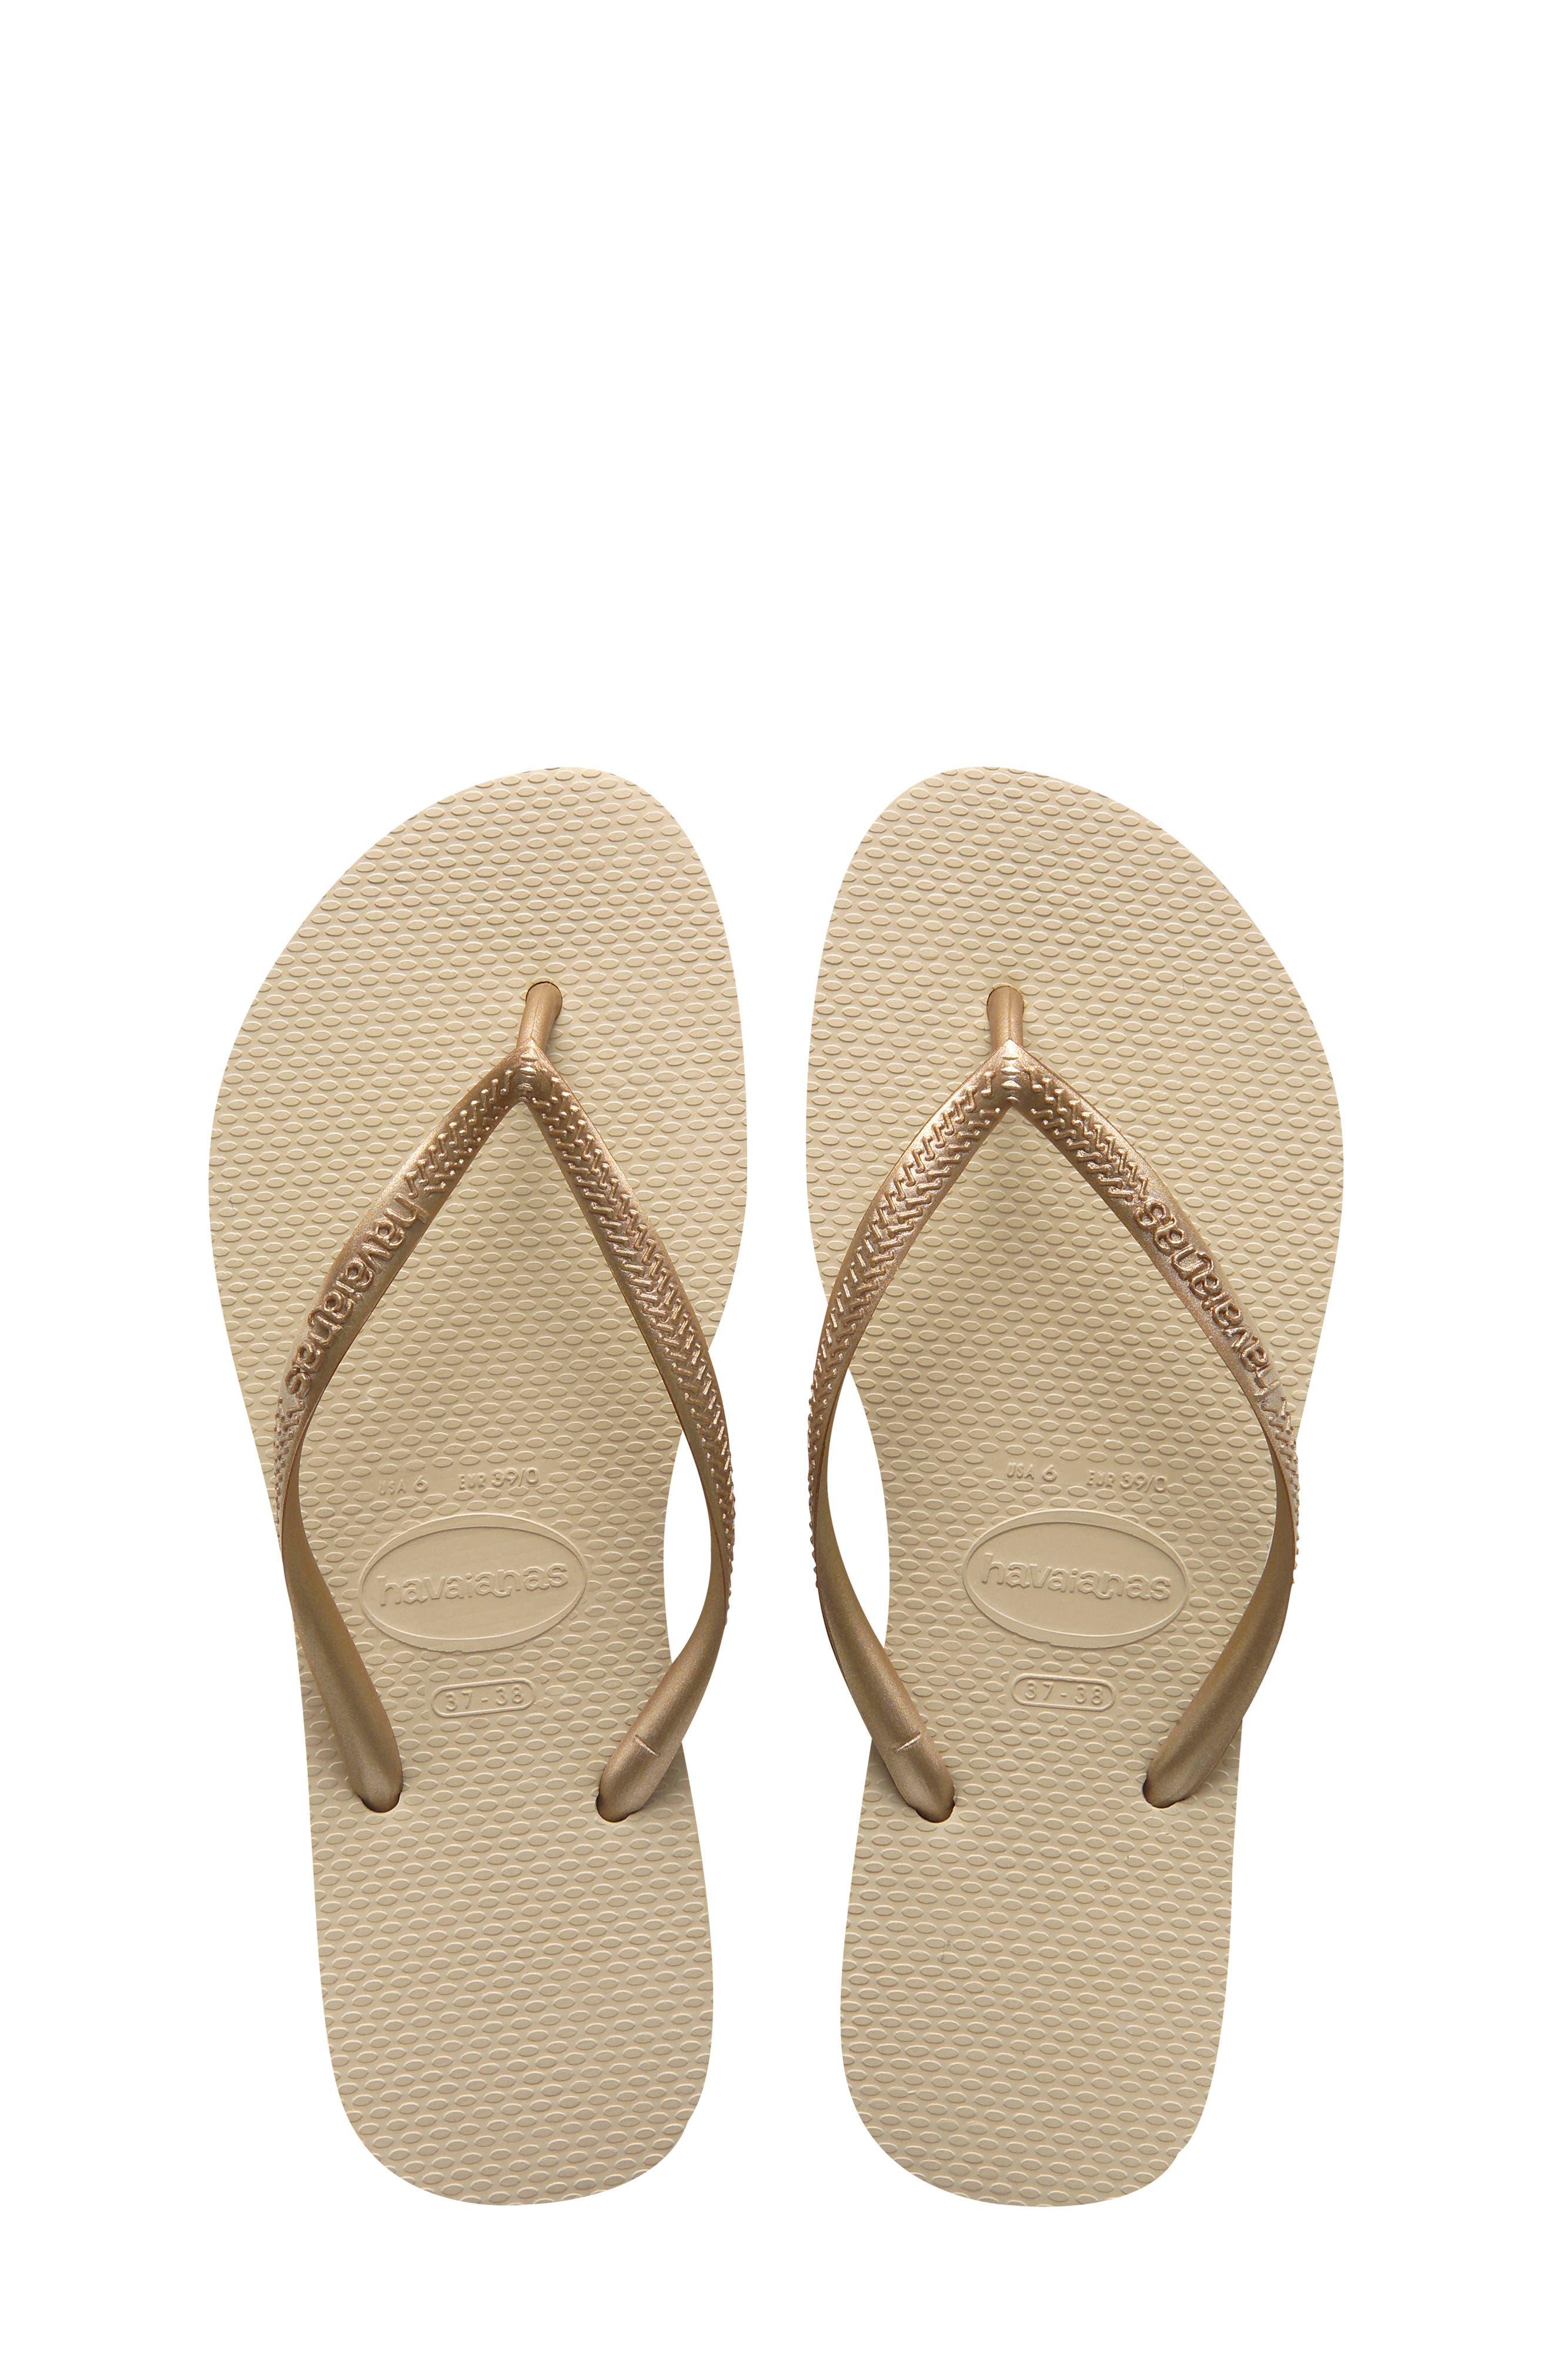 Kids Childrens Havaianas Kids Slim Frozen Lavander Thongs Sandal Flip Flop